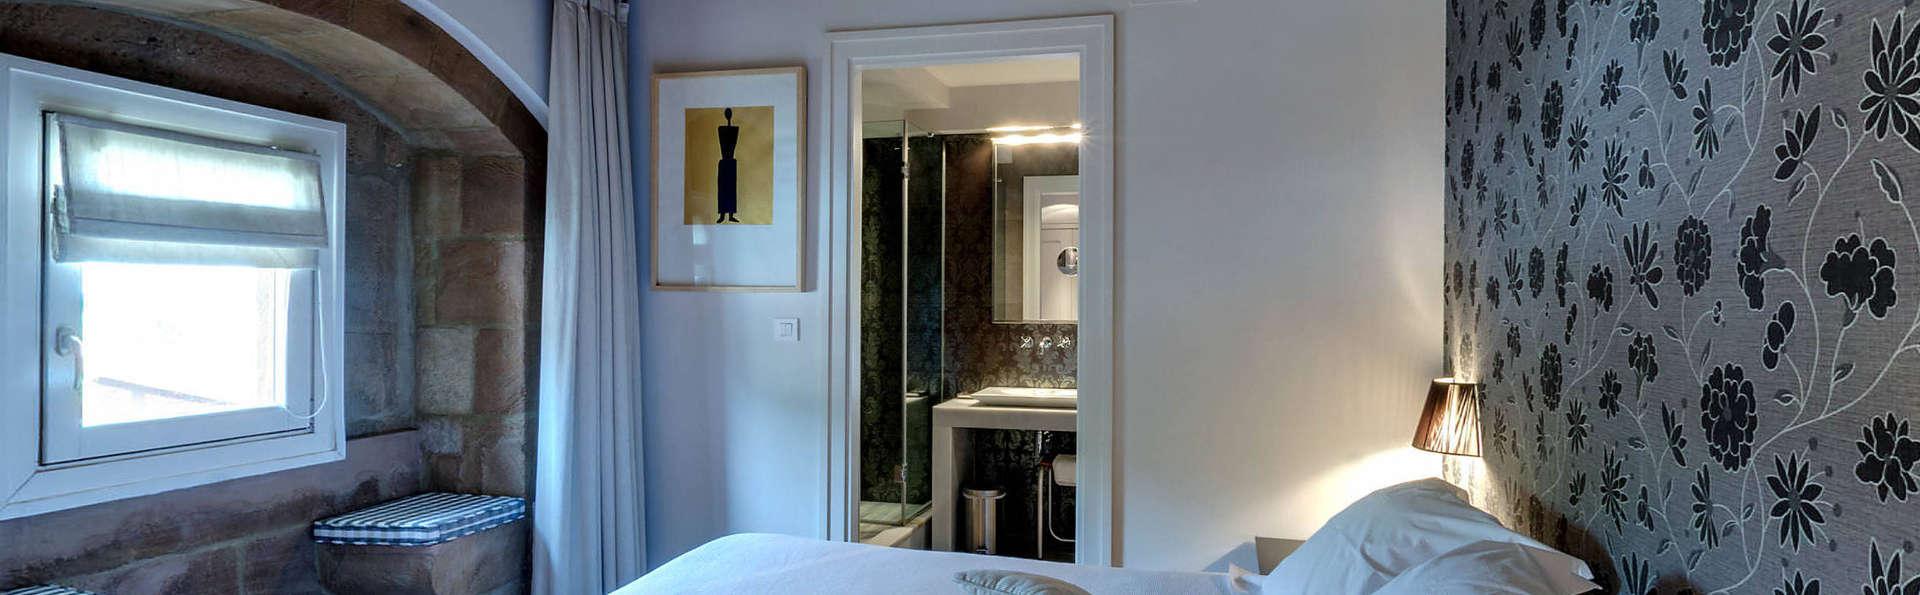 Hotel Palacio Muñatones - Habitacion_Matrimonio_Planta_2_0.jpg